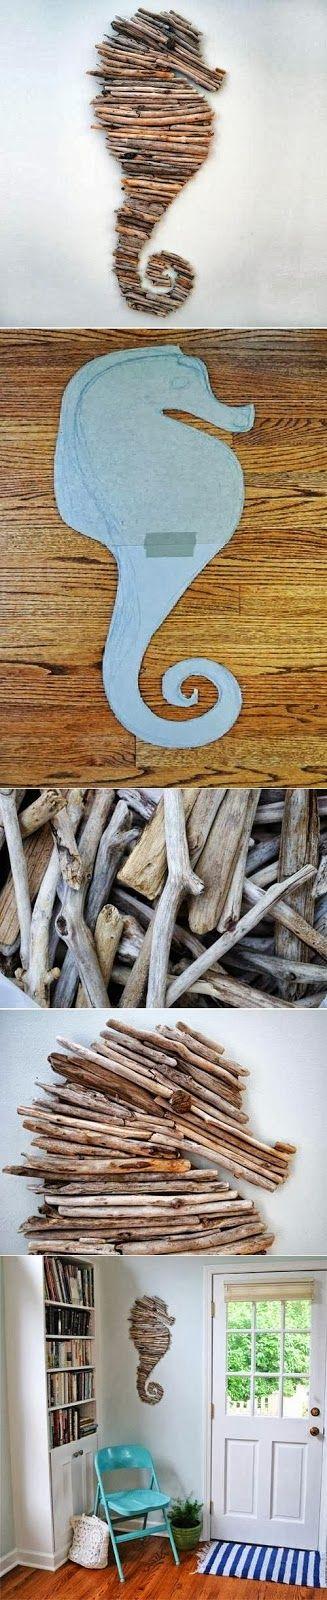 Seepferd Seepferdchen Holz Treibholz Seahorse Driftwood öcki · Deko  IdeenKreative ...